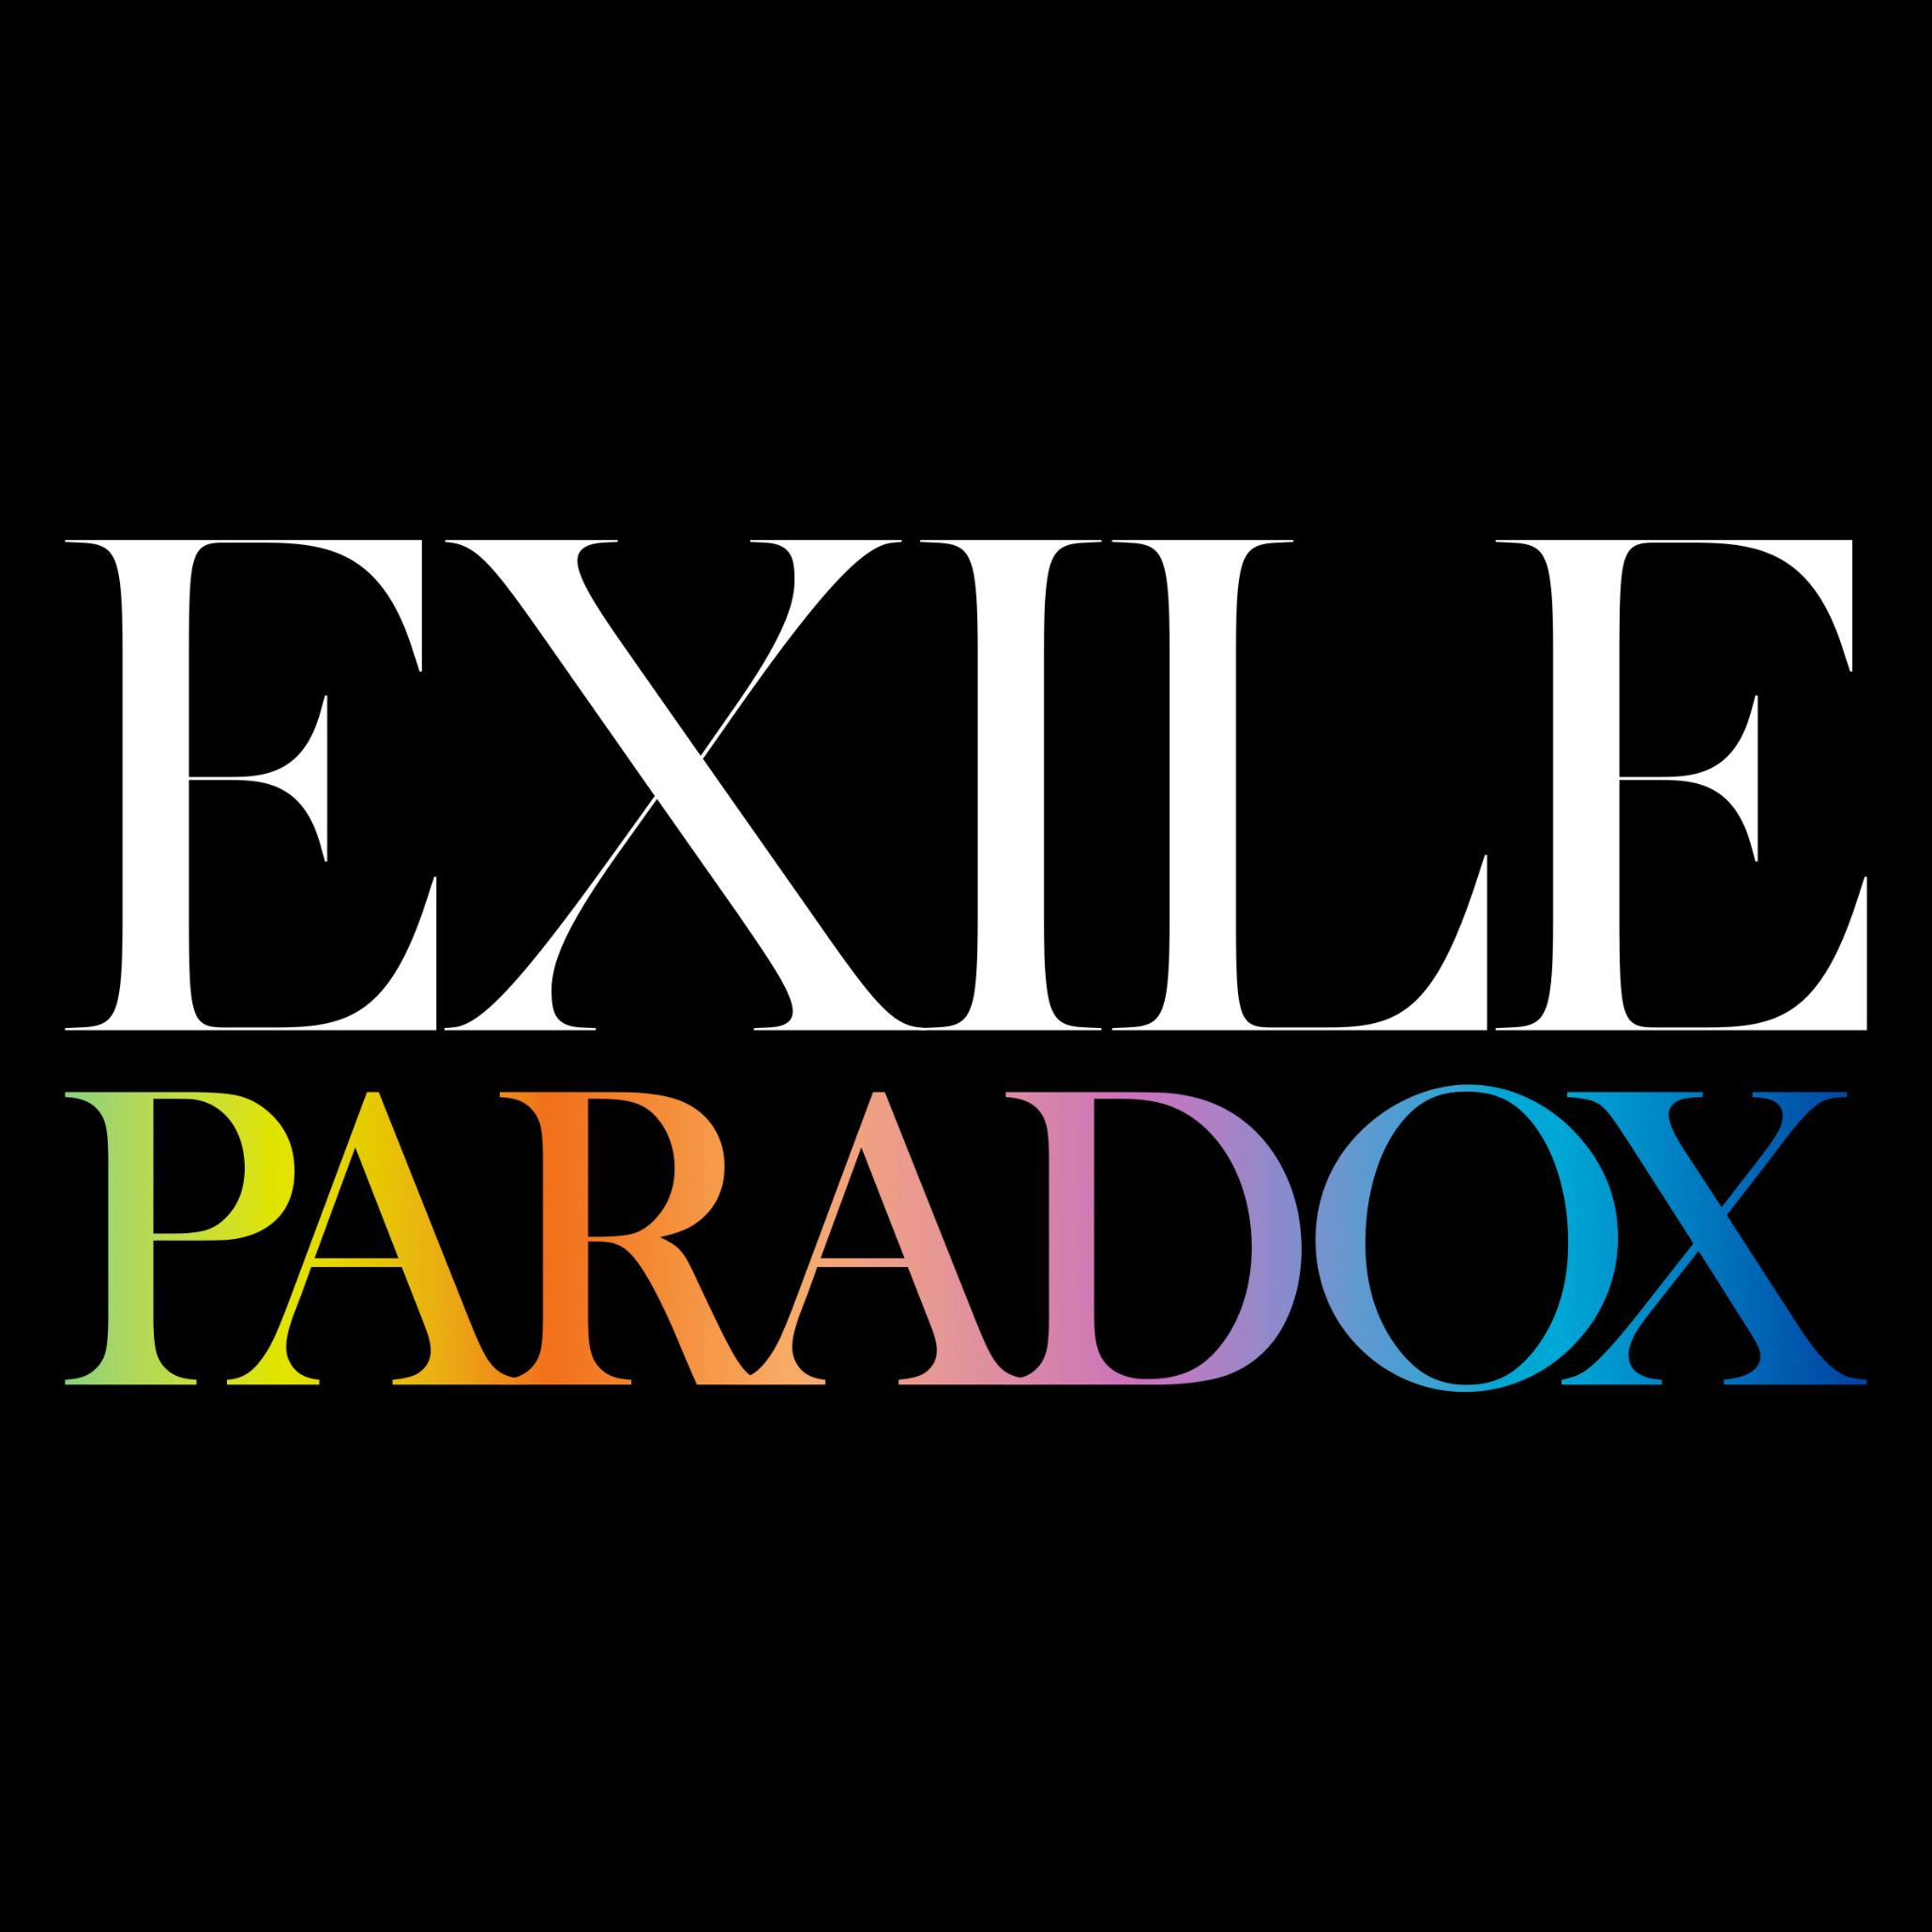 「PARADOX」配信ジャケット